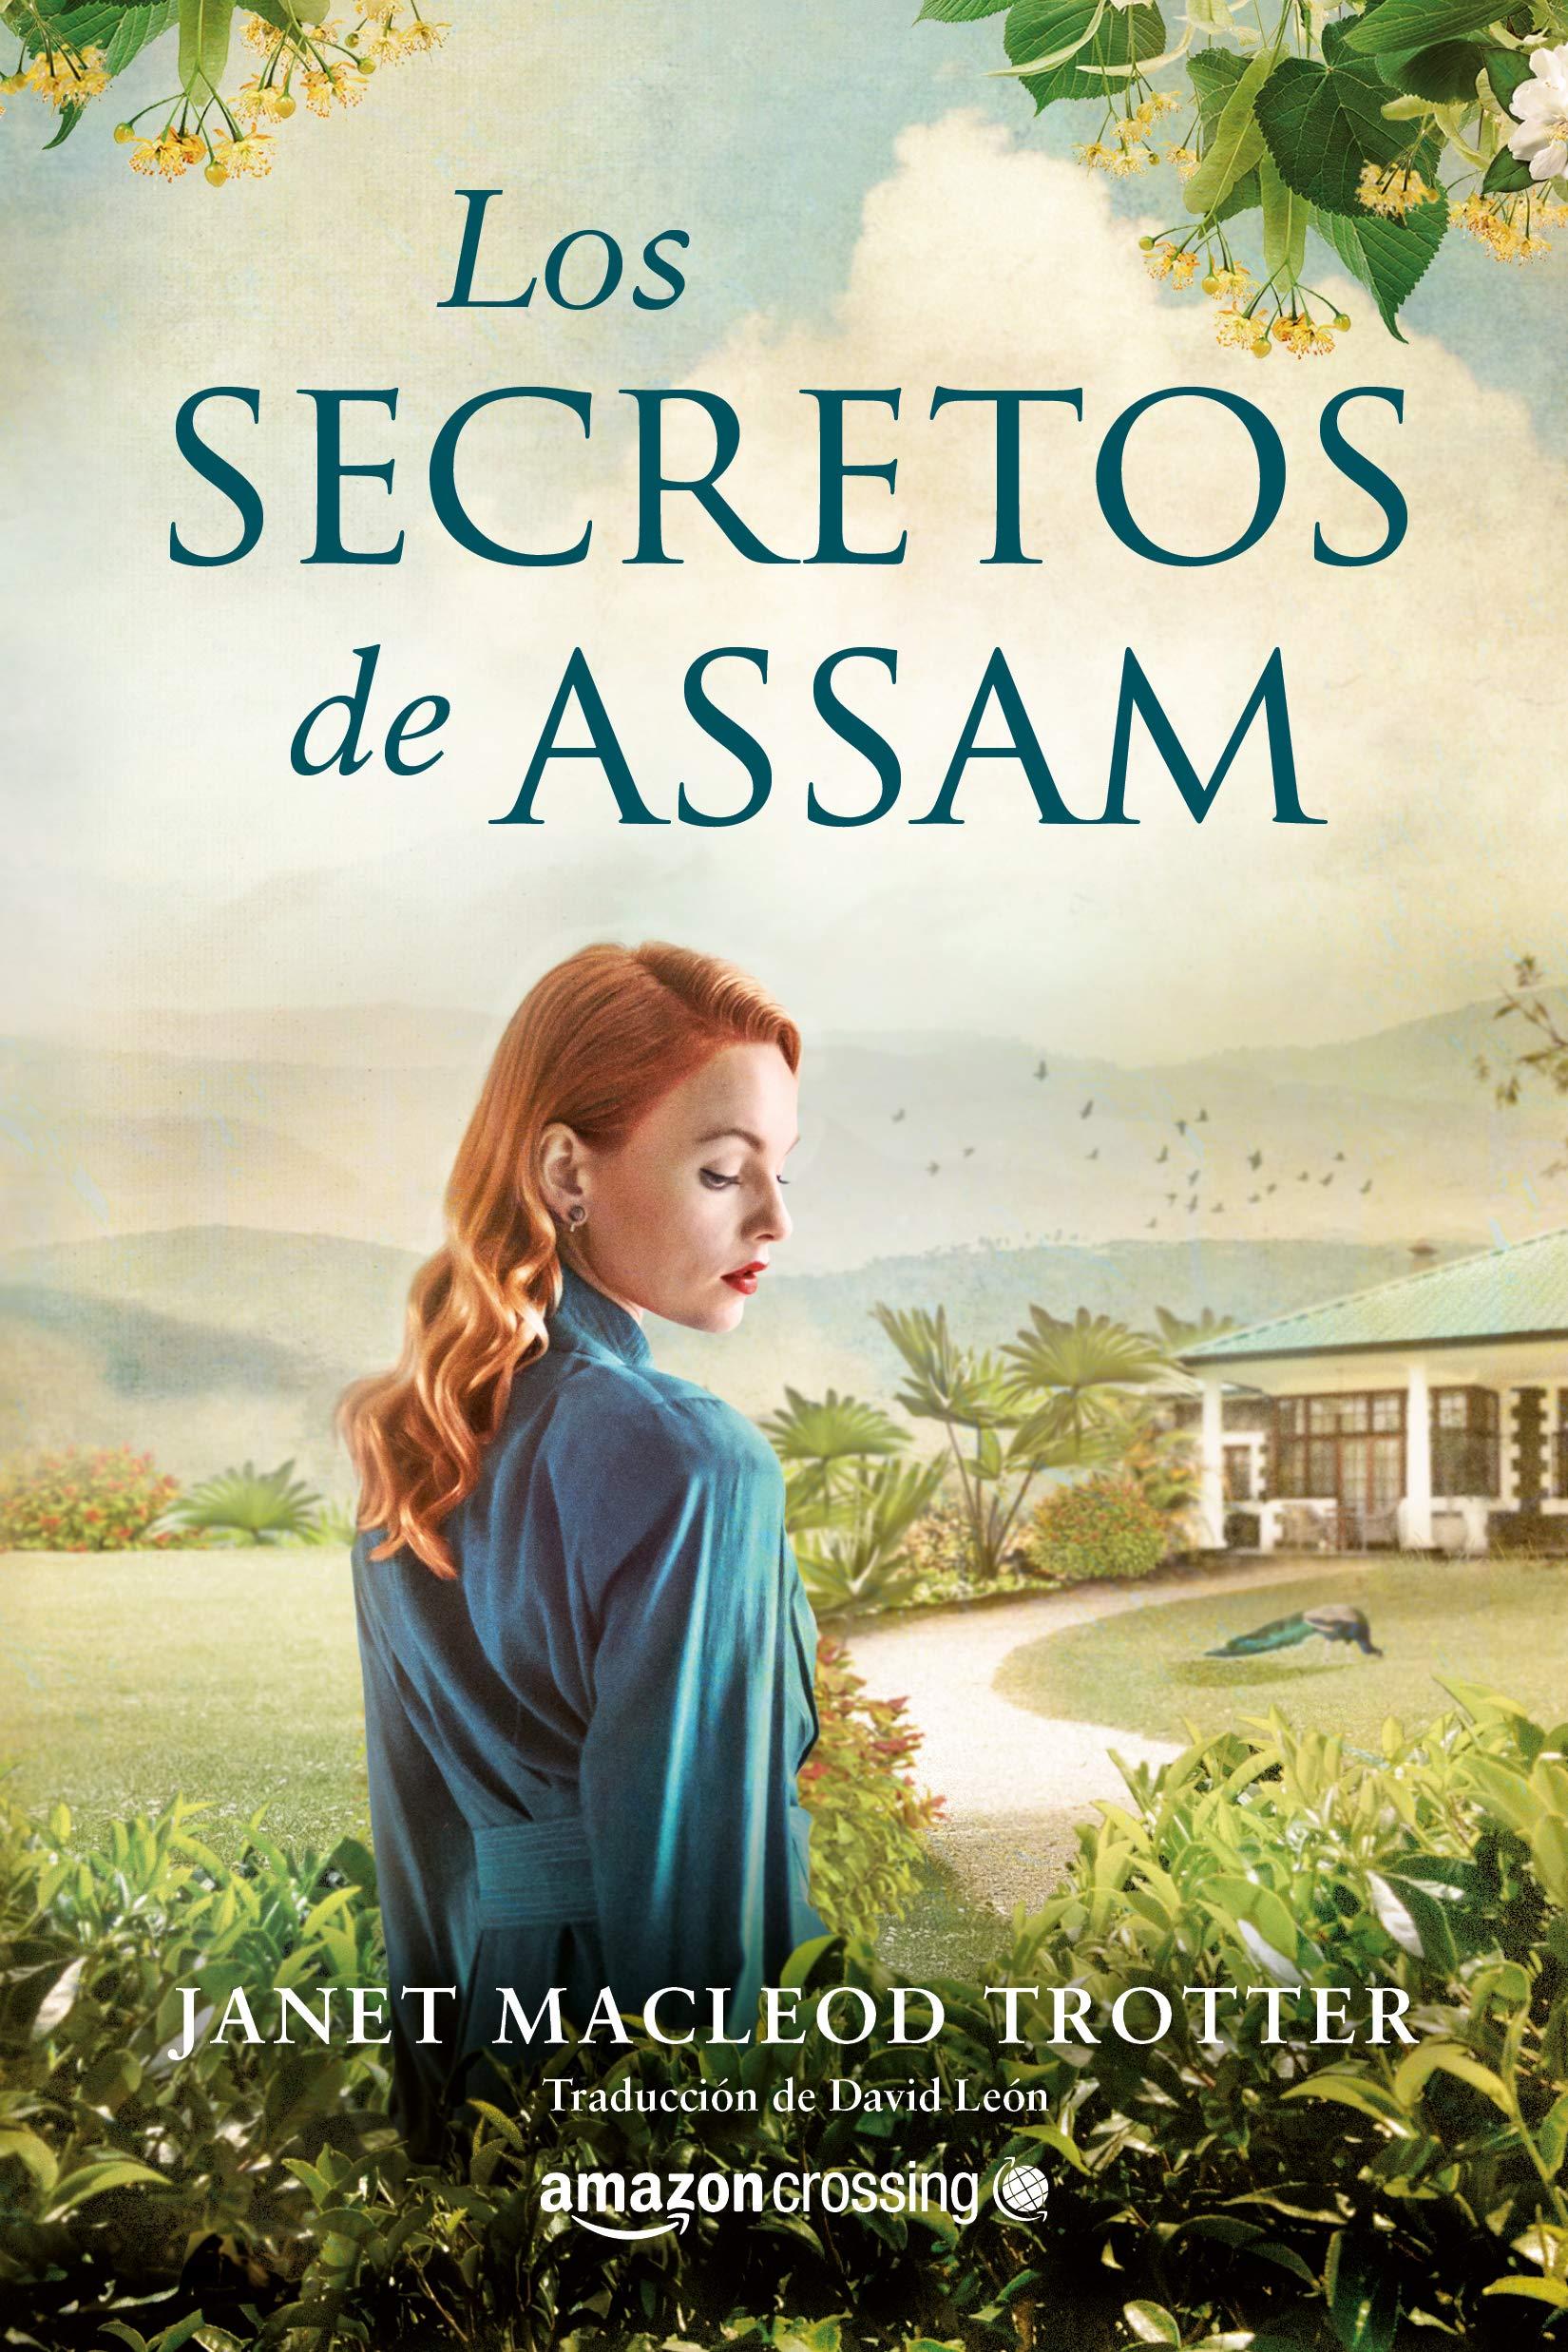 Los secretos de Assam (Aromas de té): Amazon.es: Janet MacLeod ...